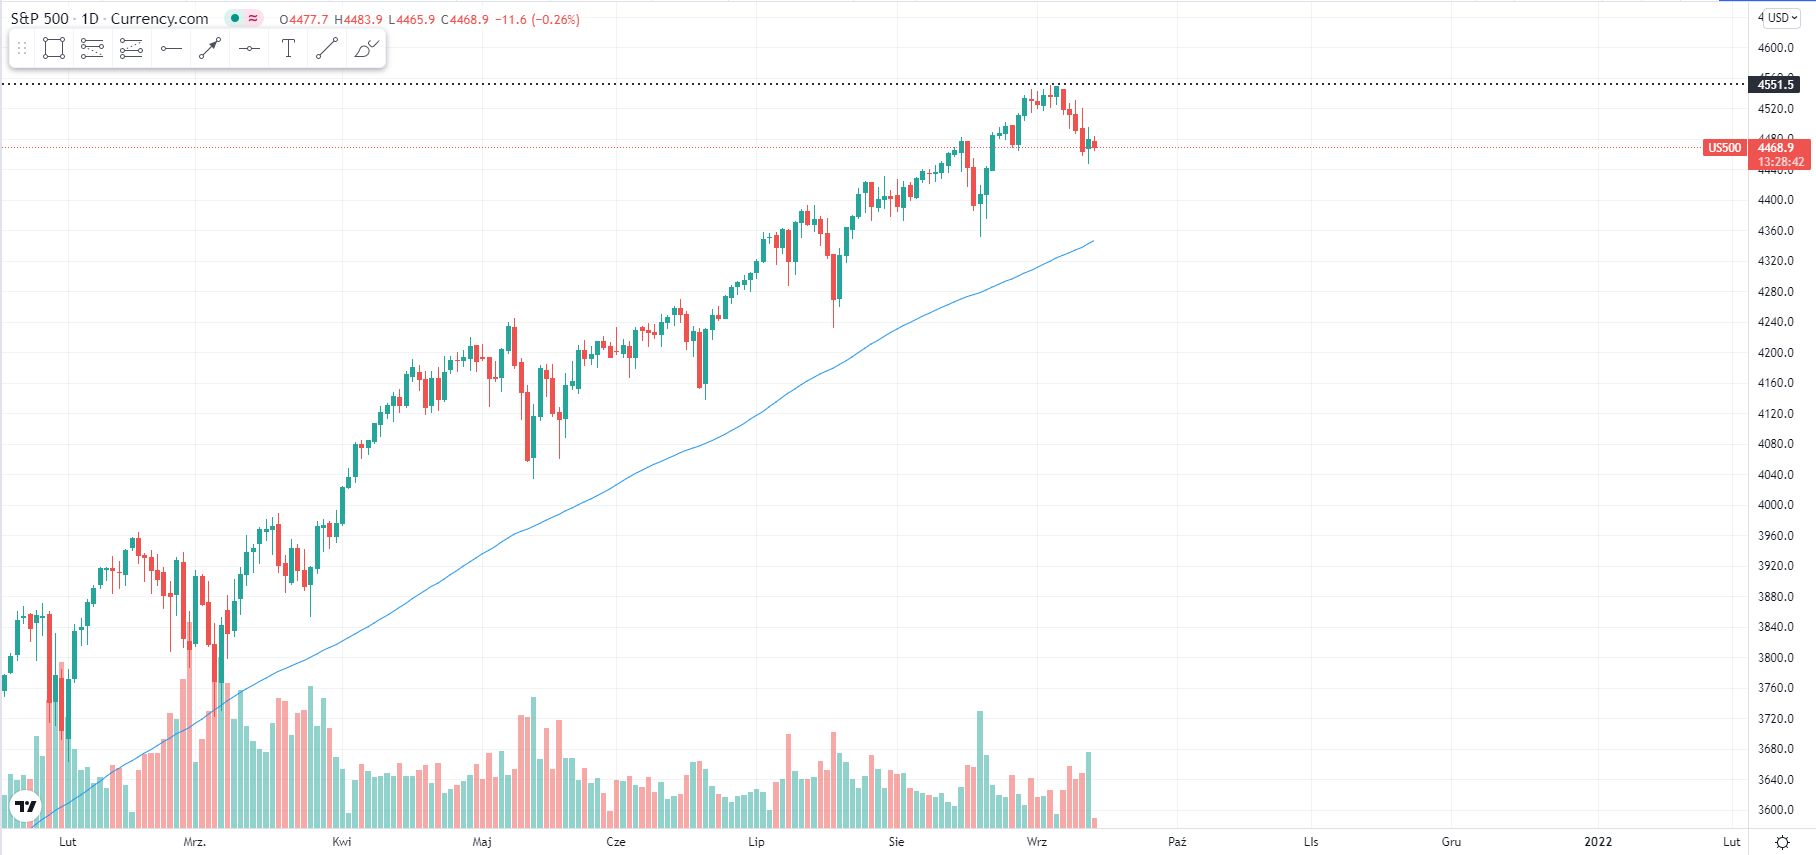 wykres Kurs indeksu S&P 500 14.09.2021